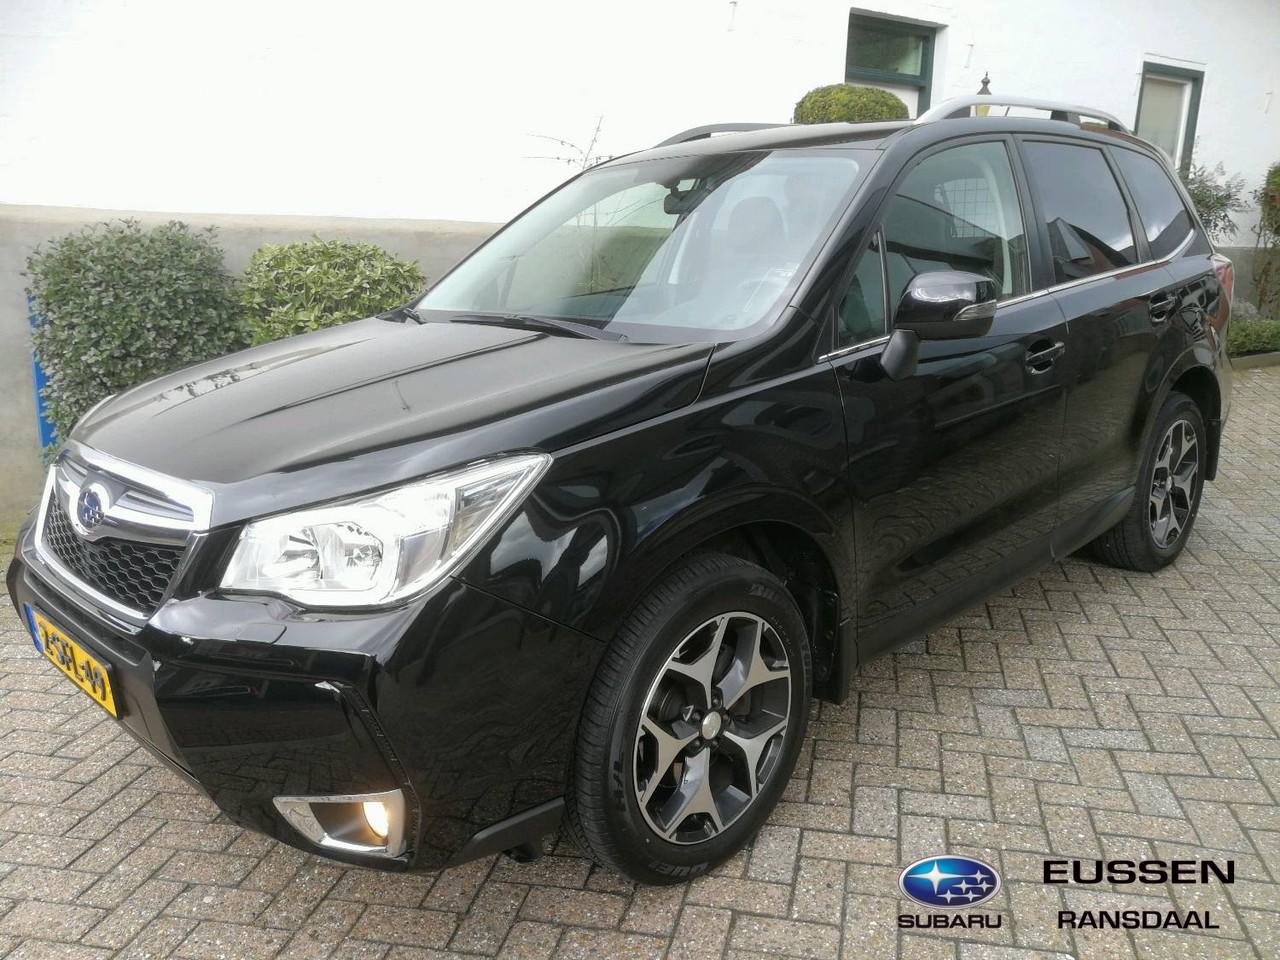 Subaru Forester 2.0 xt sport navigatie / trekhaak / zeer nette auto